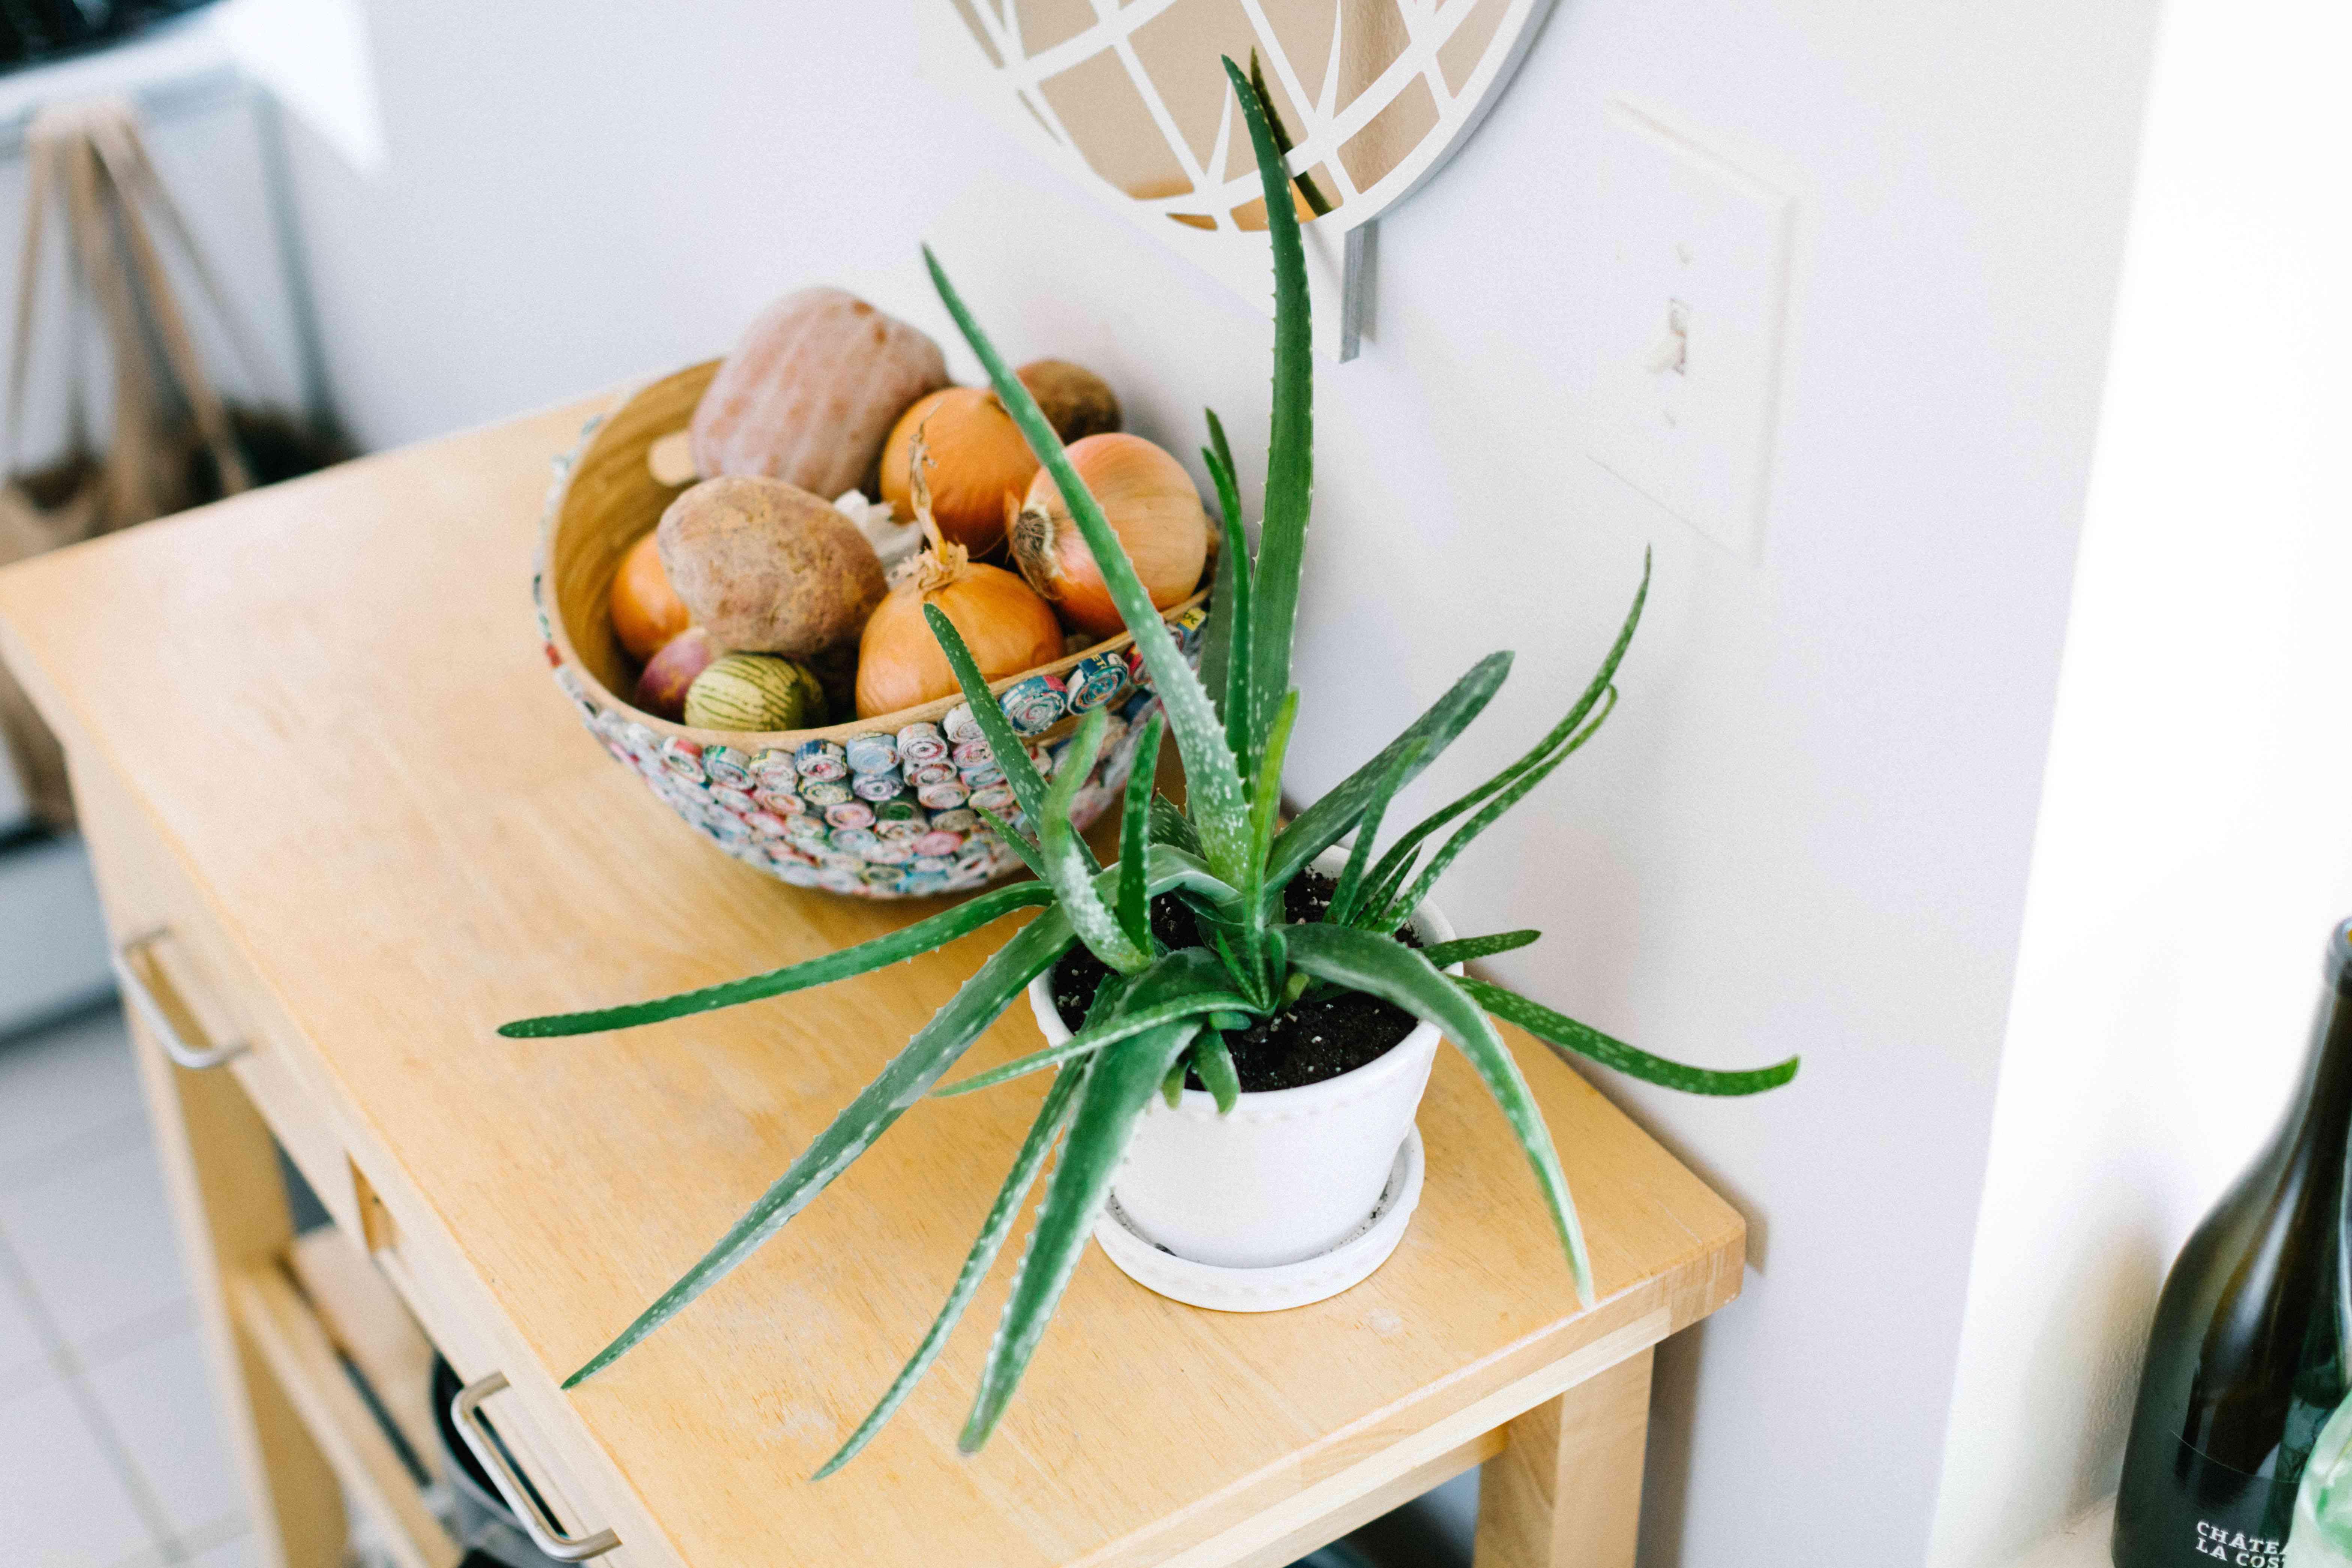 aloe vera plant in kitchen on butcher block